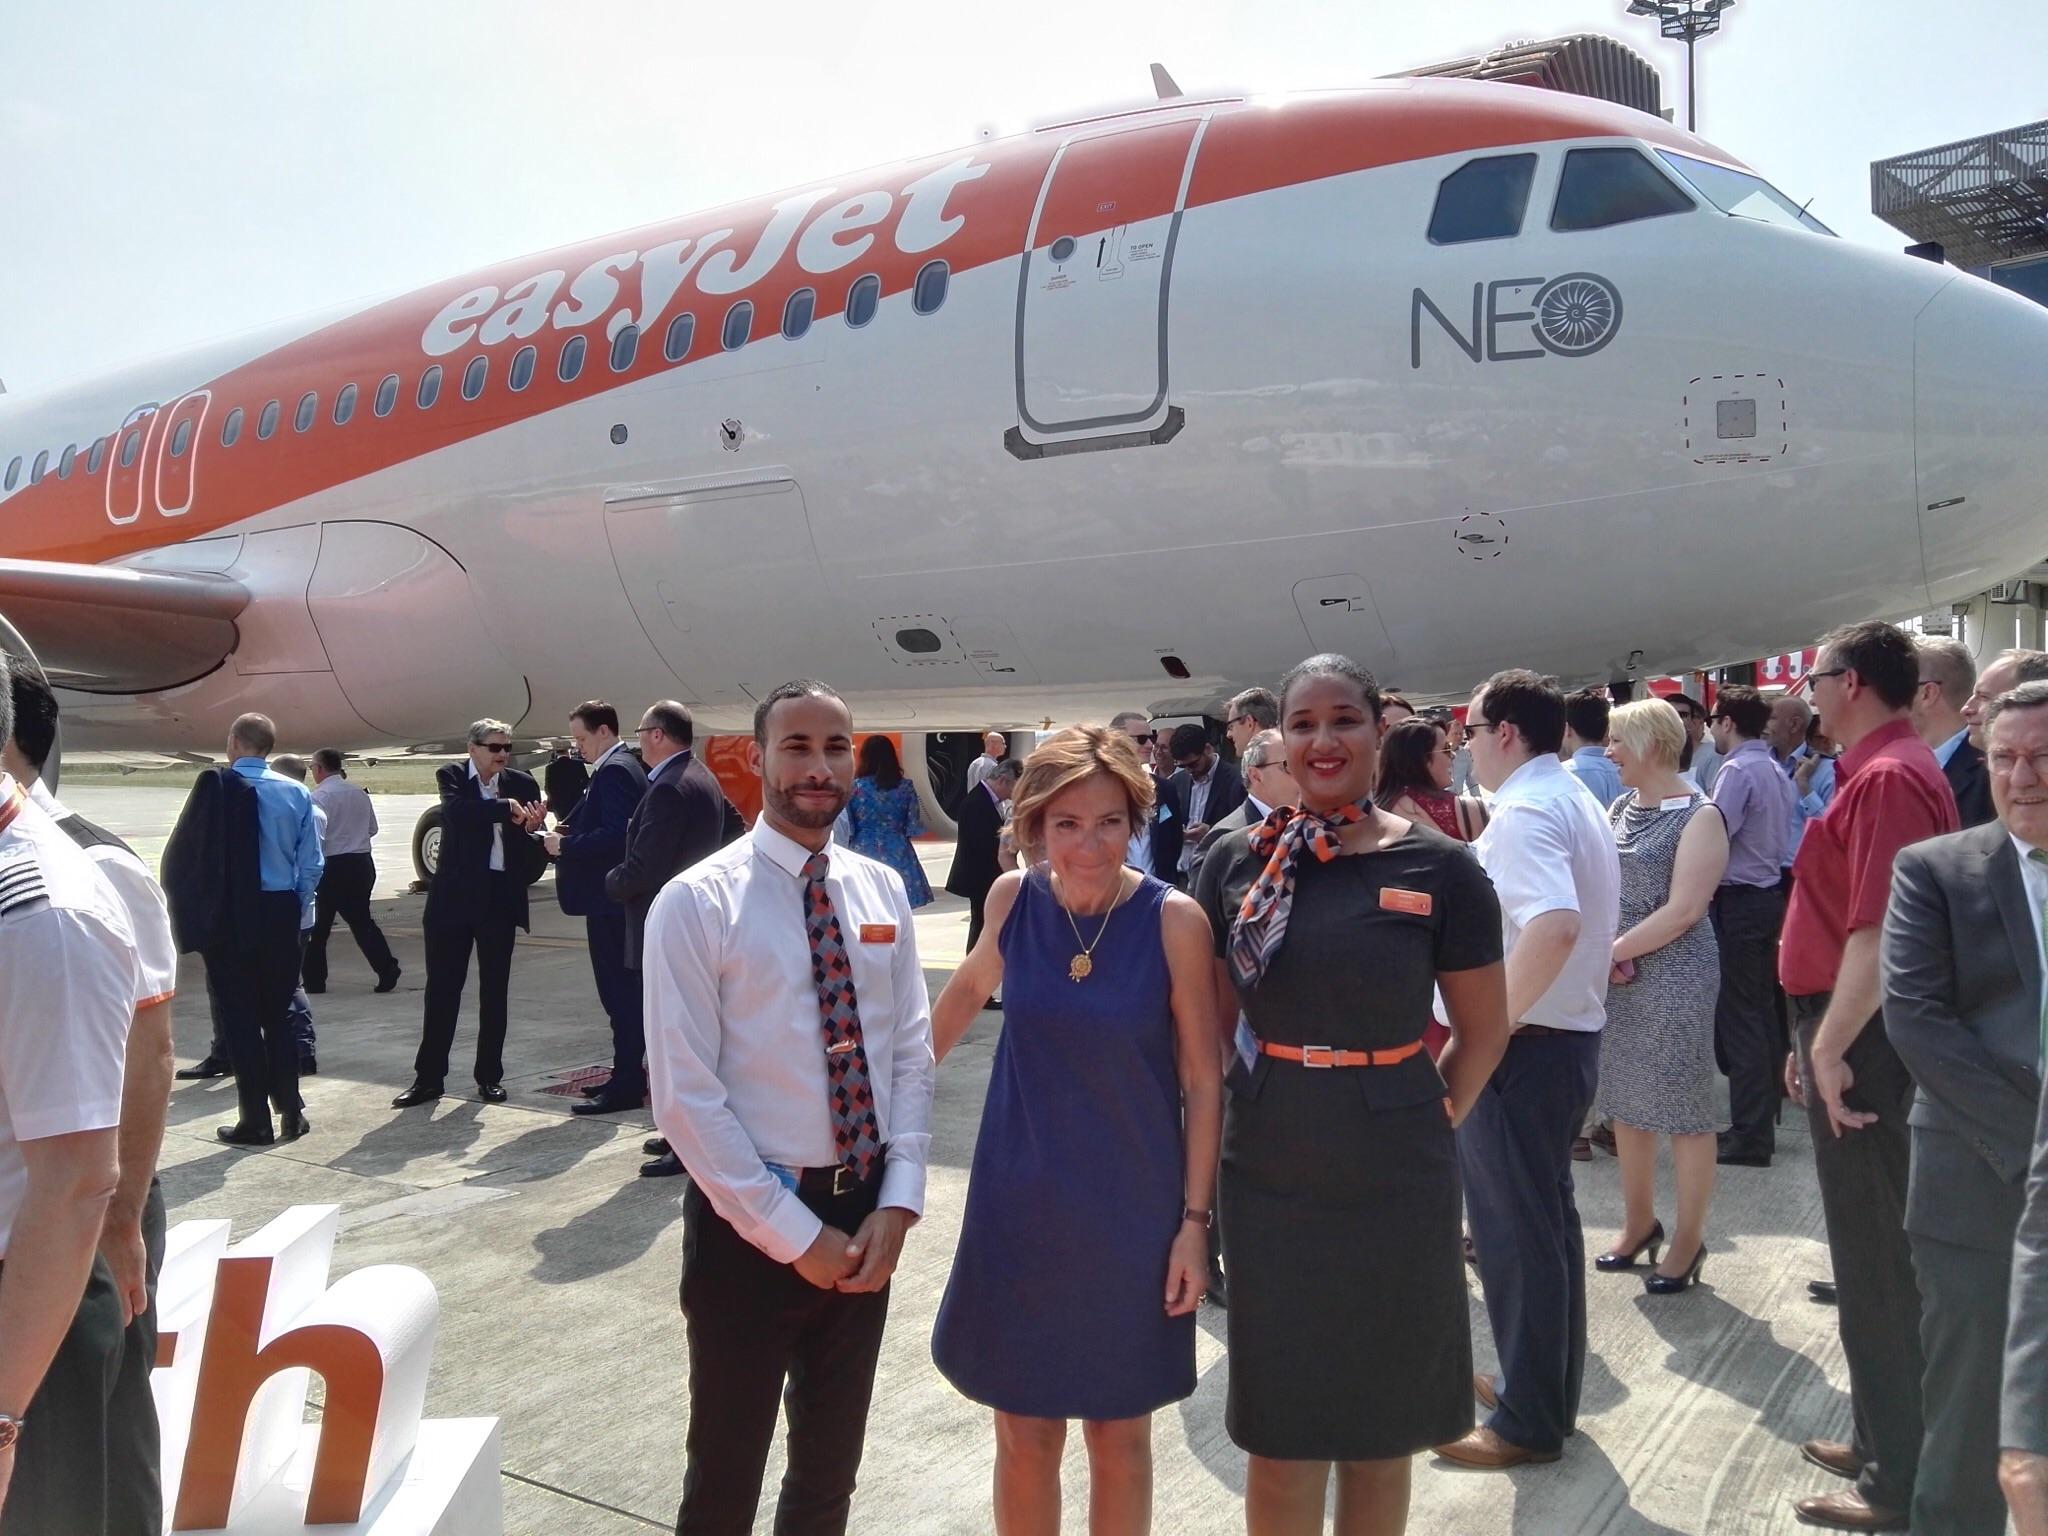 Si alza il velo, Easyjet interessata ad Alitalia